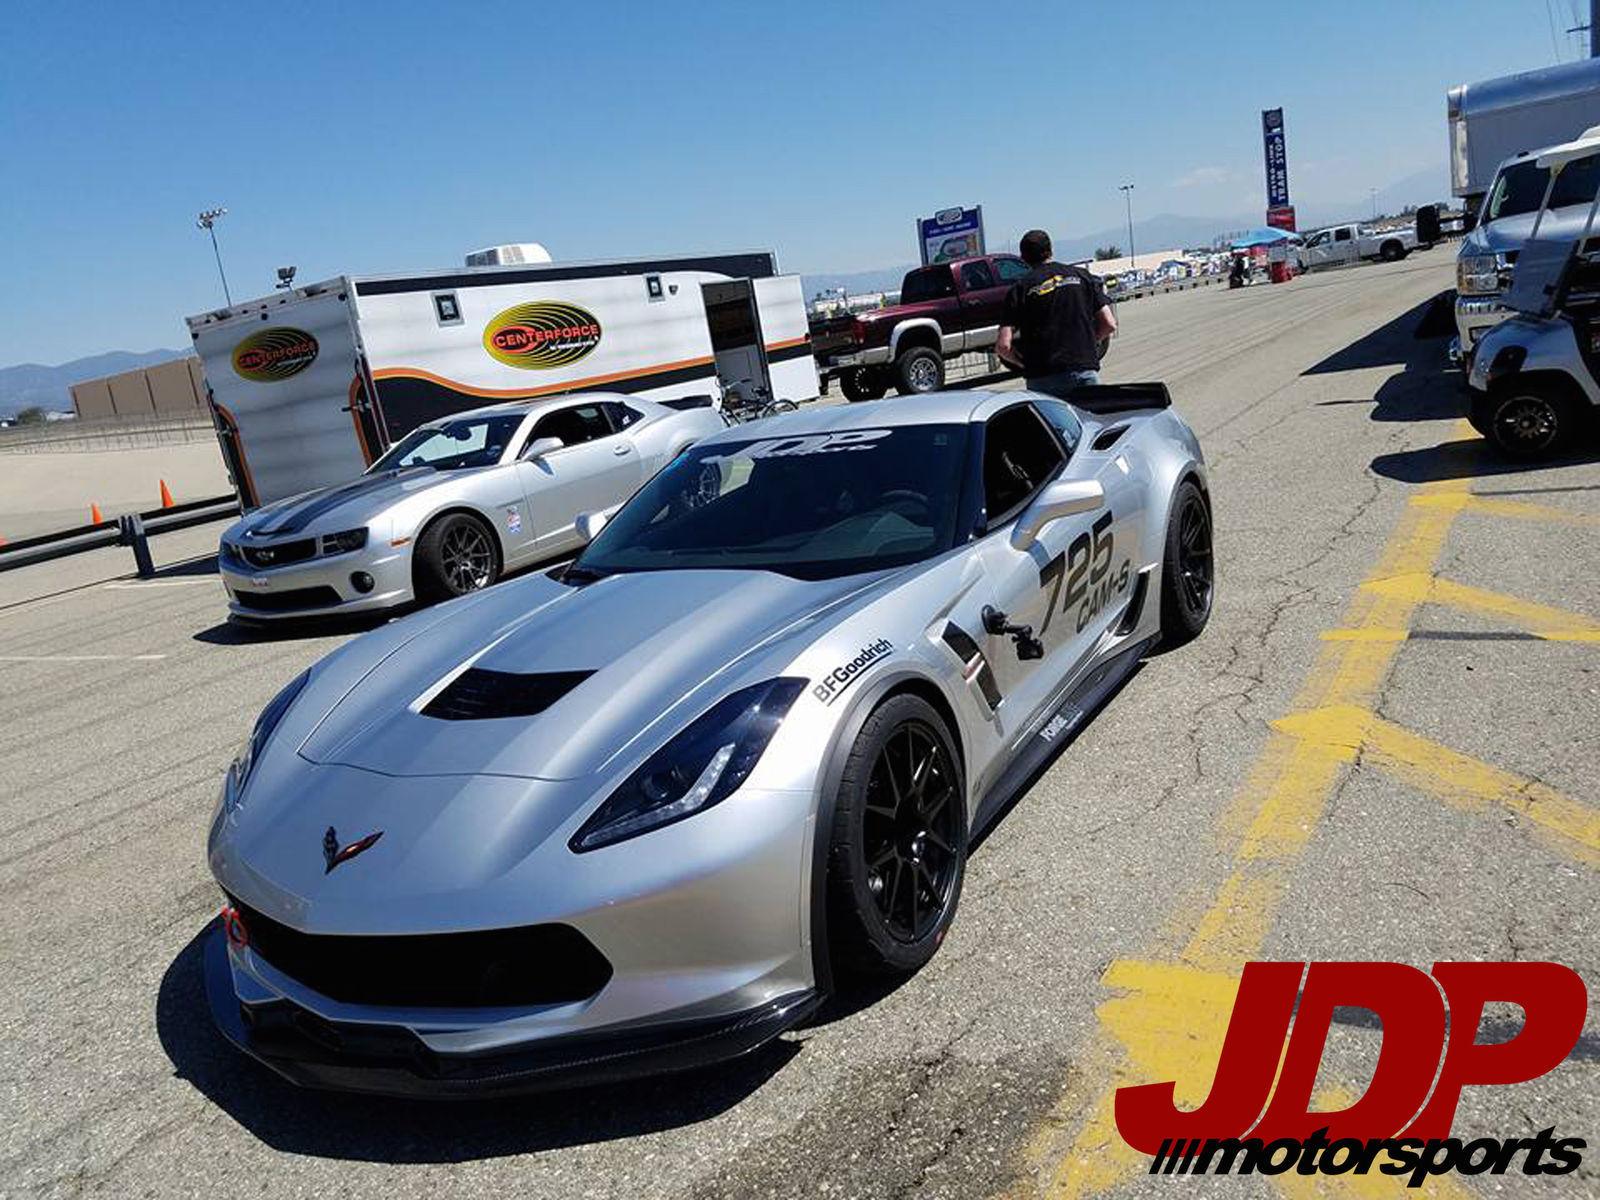 2017 Chevrolet Corvette Z06 | Jordan Priestley Wins at NMCA West Autocross in the JDP Motorsports Covette Grand Sport on Forgeline GA1R Open Lug Wheels